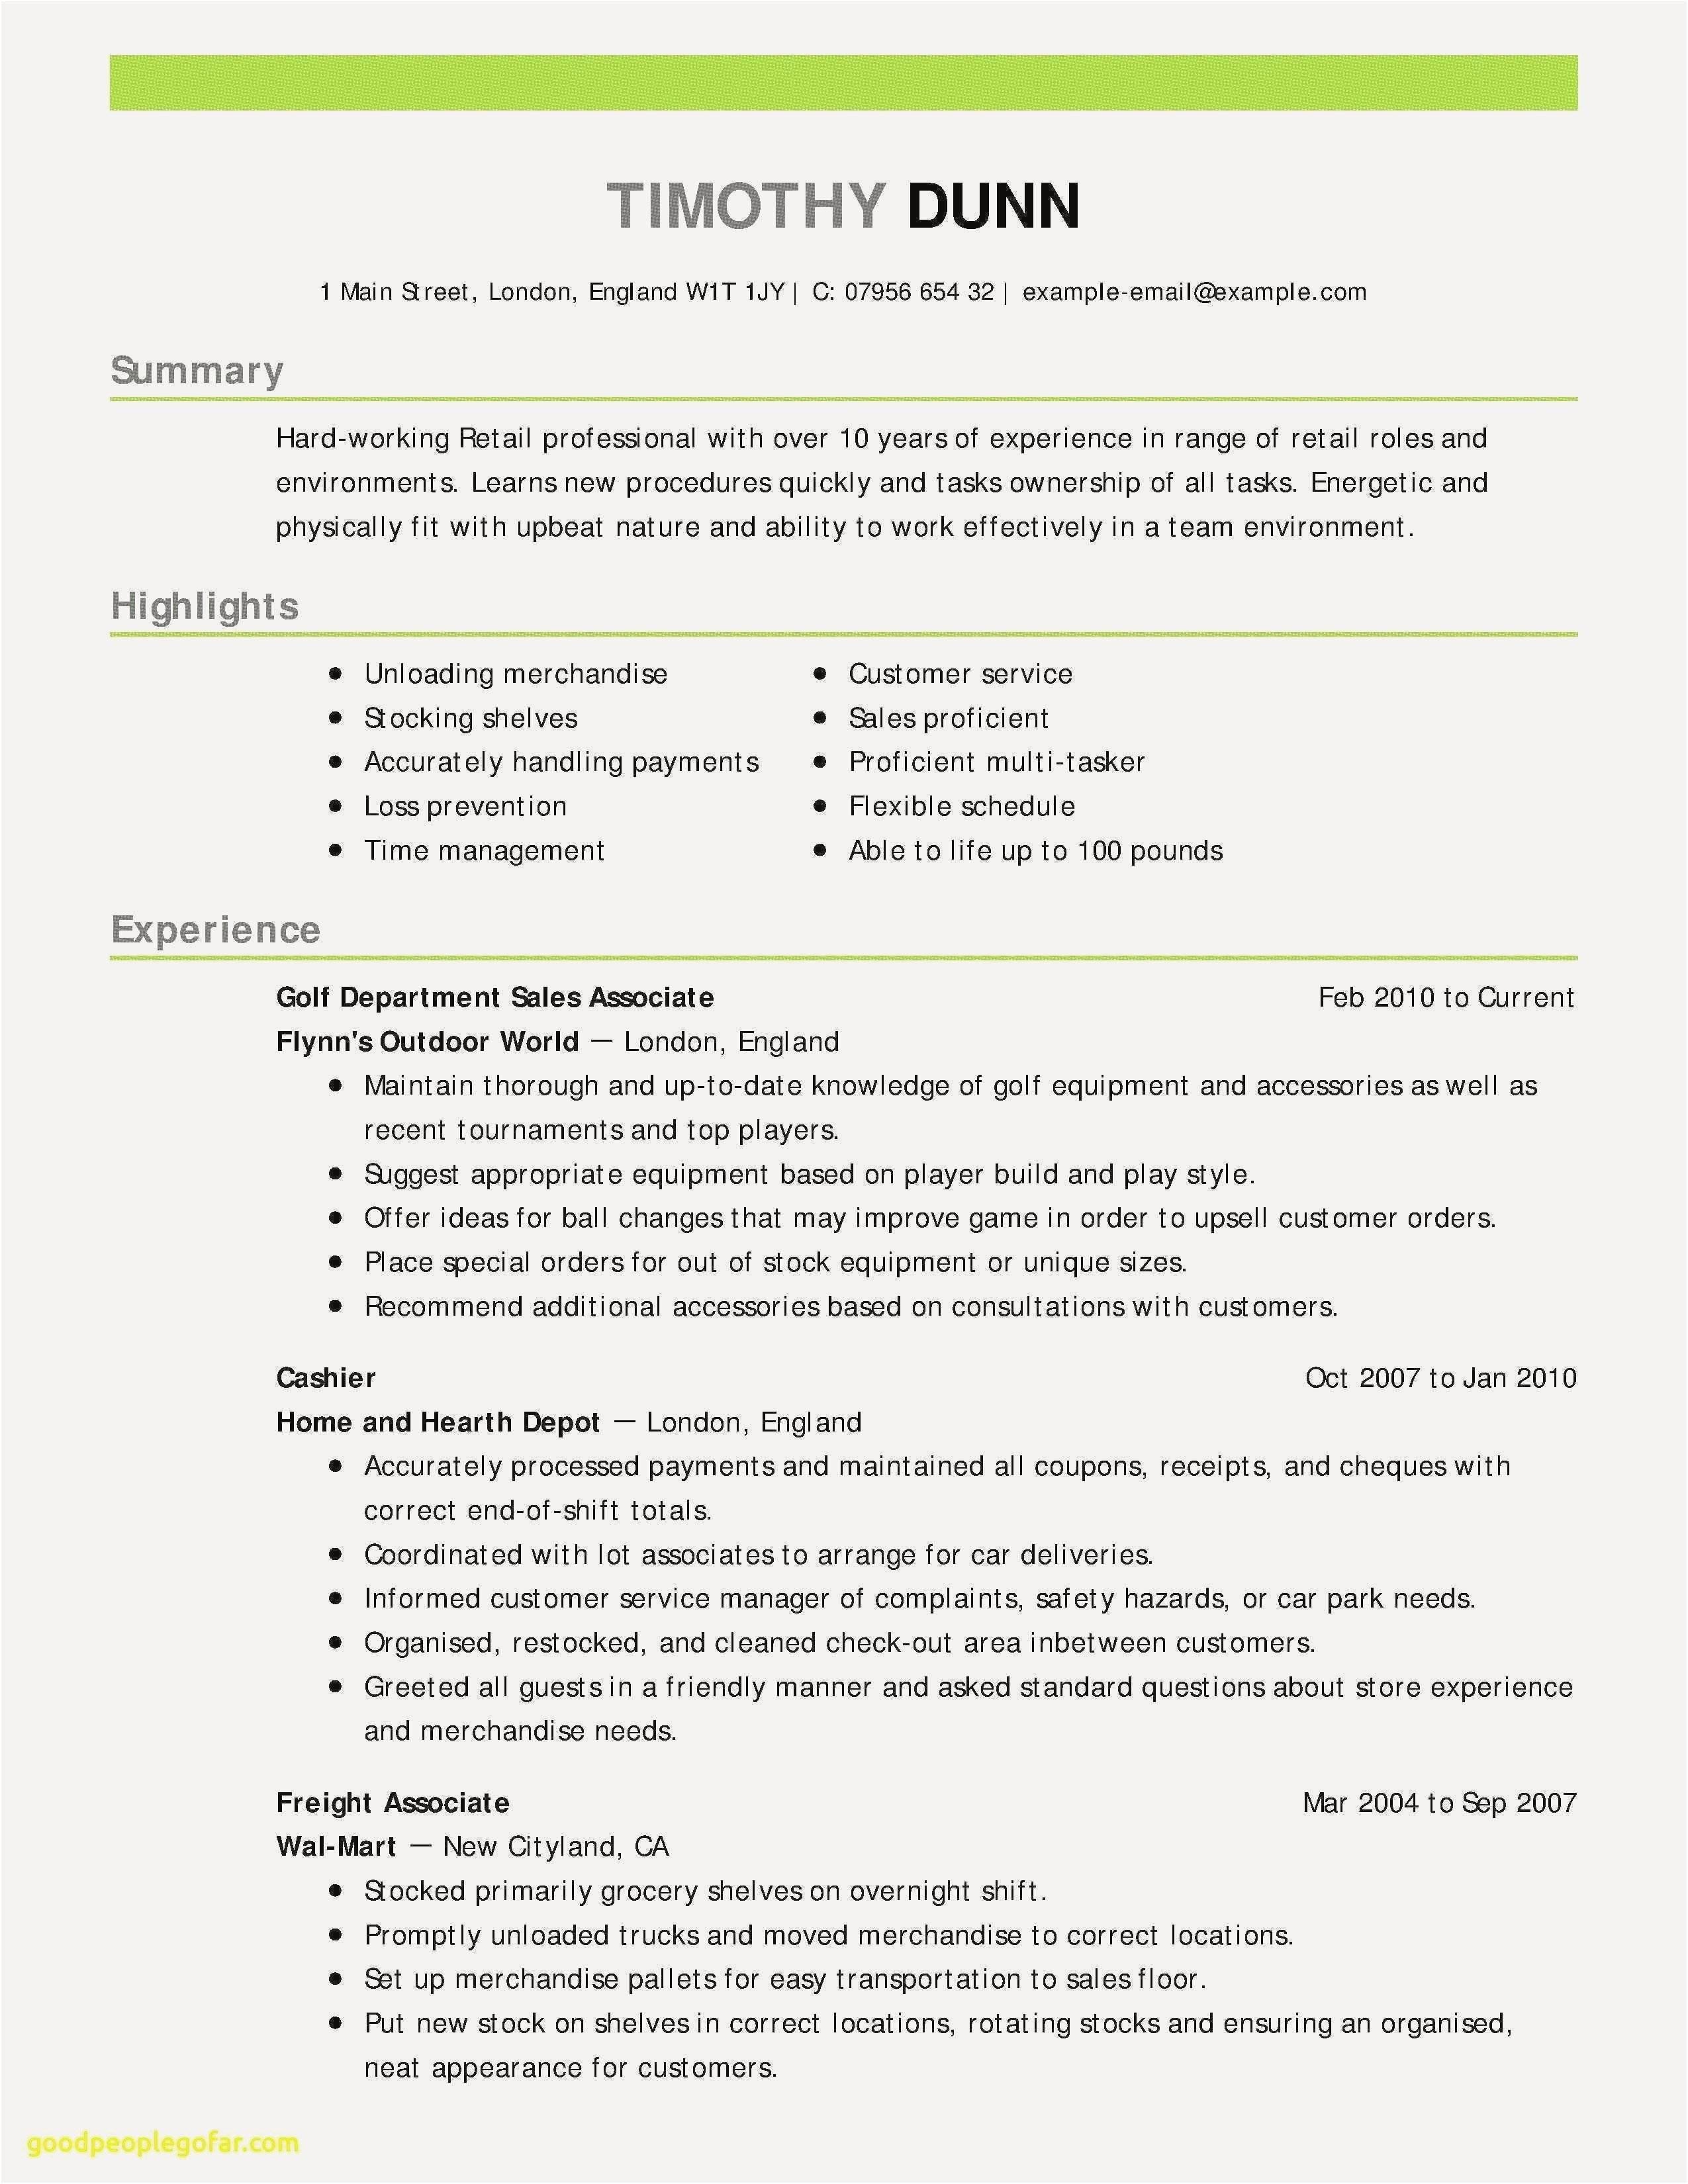 How To Write A Receipt Resume Format Samples Sample Resume Skills Fresh Resume Examples 0d How To Write A Receipt